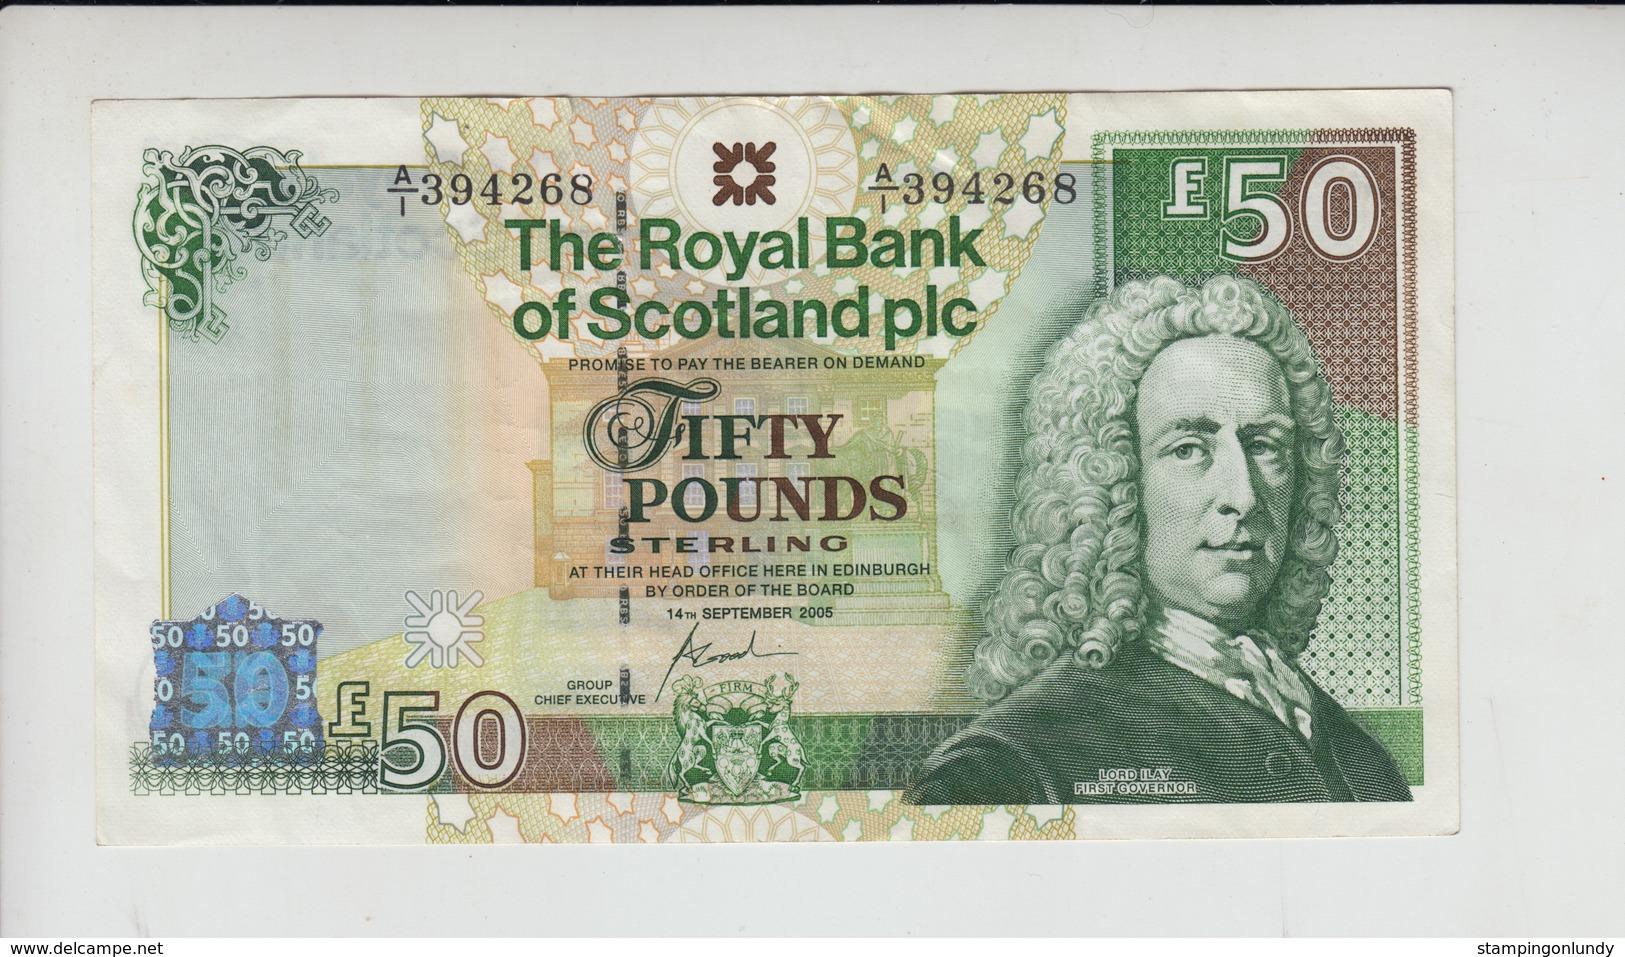 AB378. The Royal Bank Of Scotland Plc £50 Banknote 14th Sept 2005 #A/1 394268  FREE UK P+P - 50 Pounds